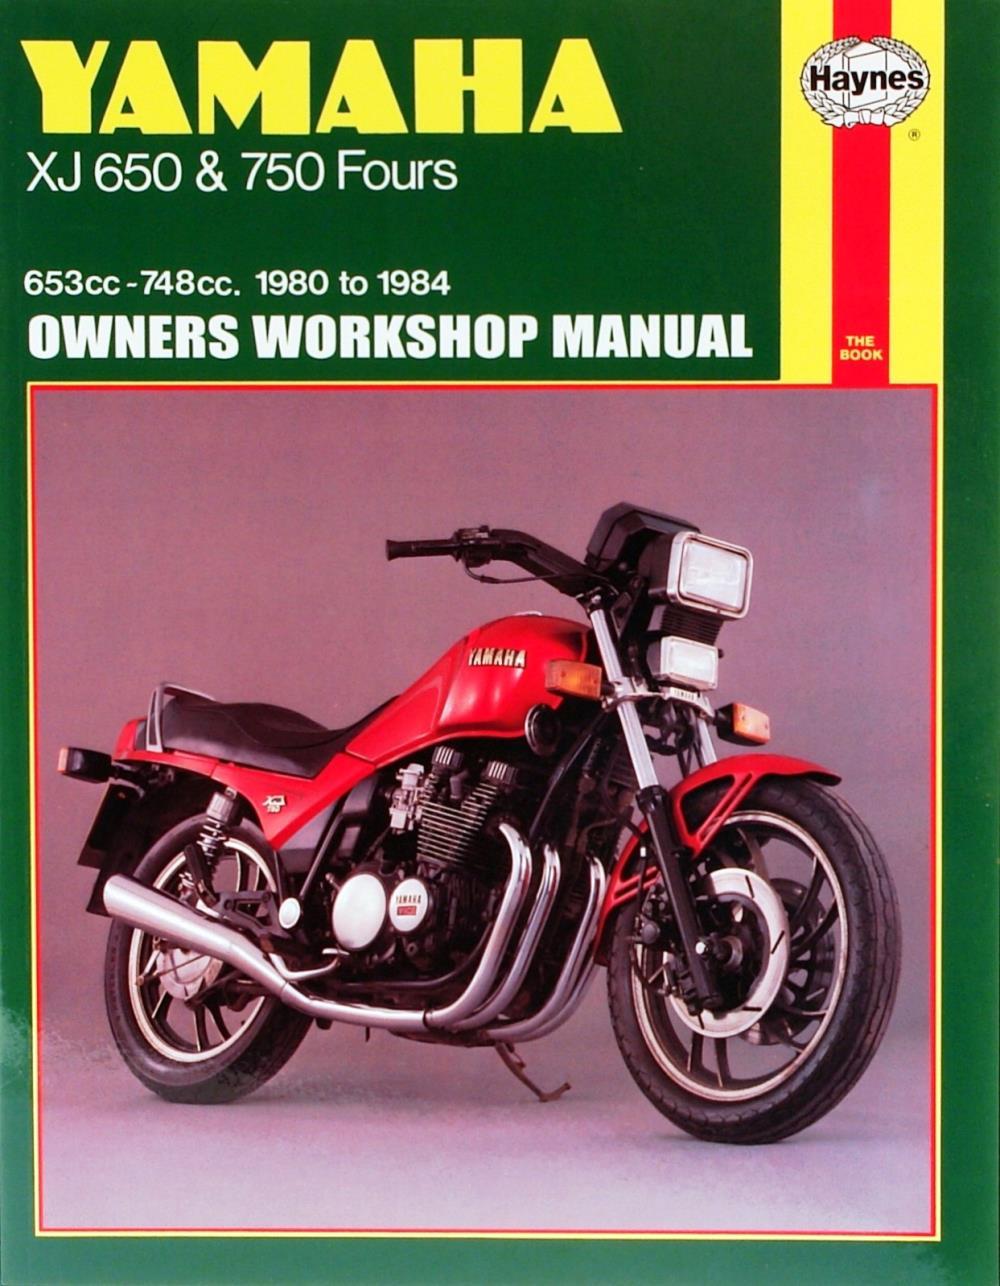 1982 Yamaha Maxim Owners Manual Xj650 Wiring Diagram Haynes For Xj 650 Uk Model Ebay Rh Co 550 Service